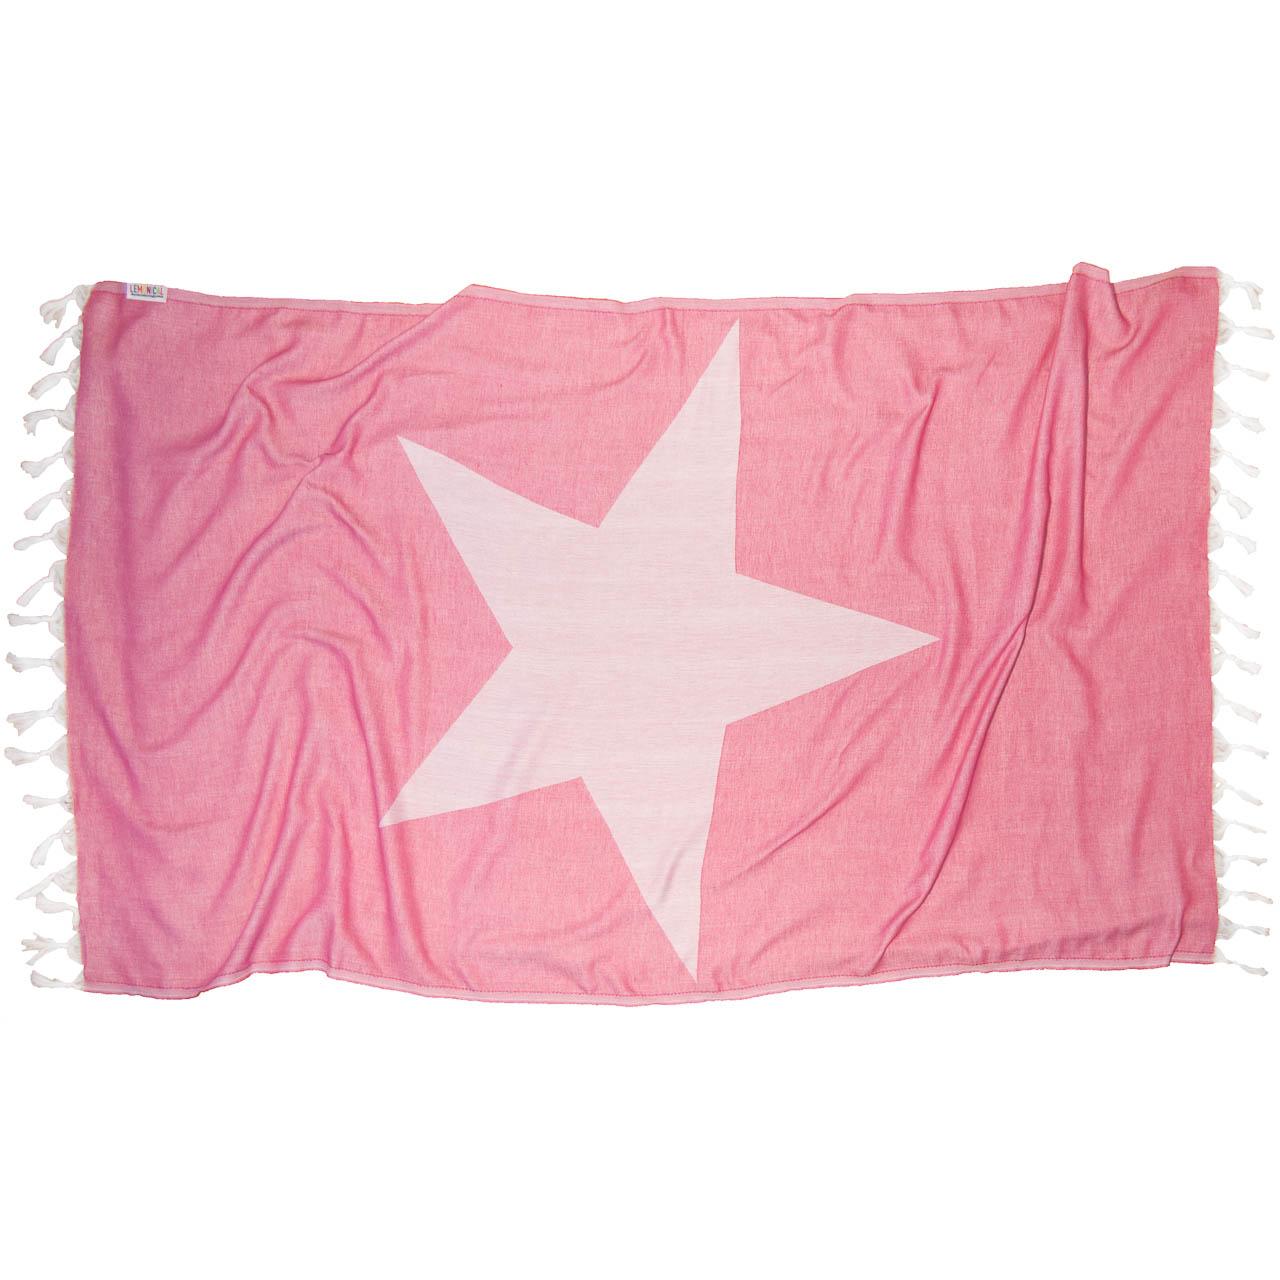 PINK STAR Beach Towel